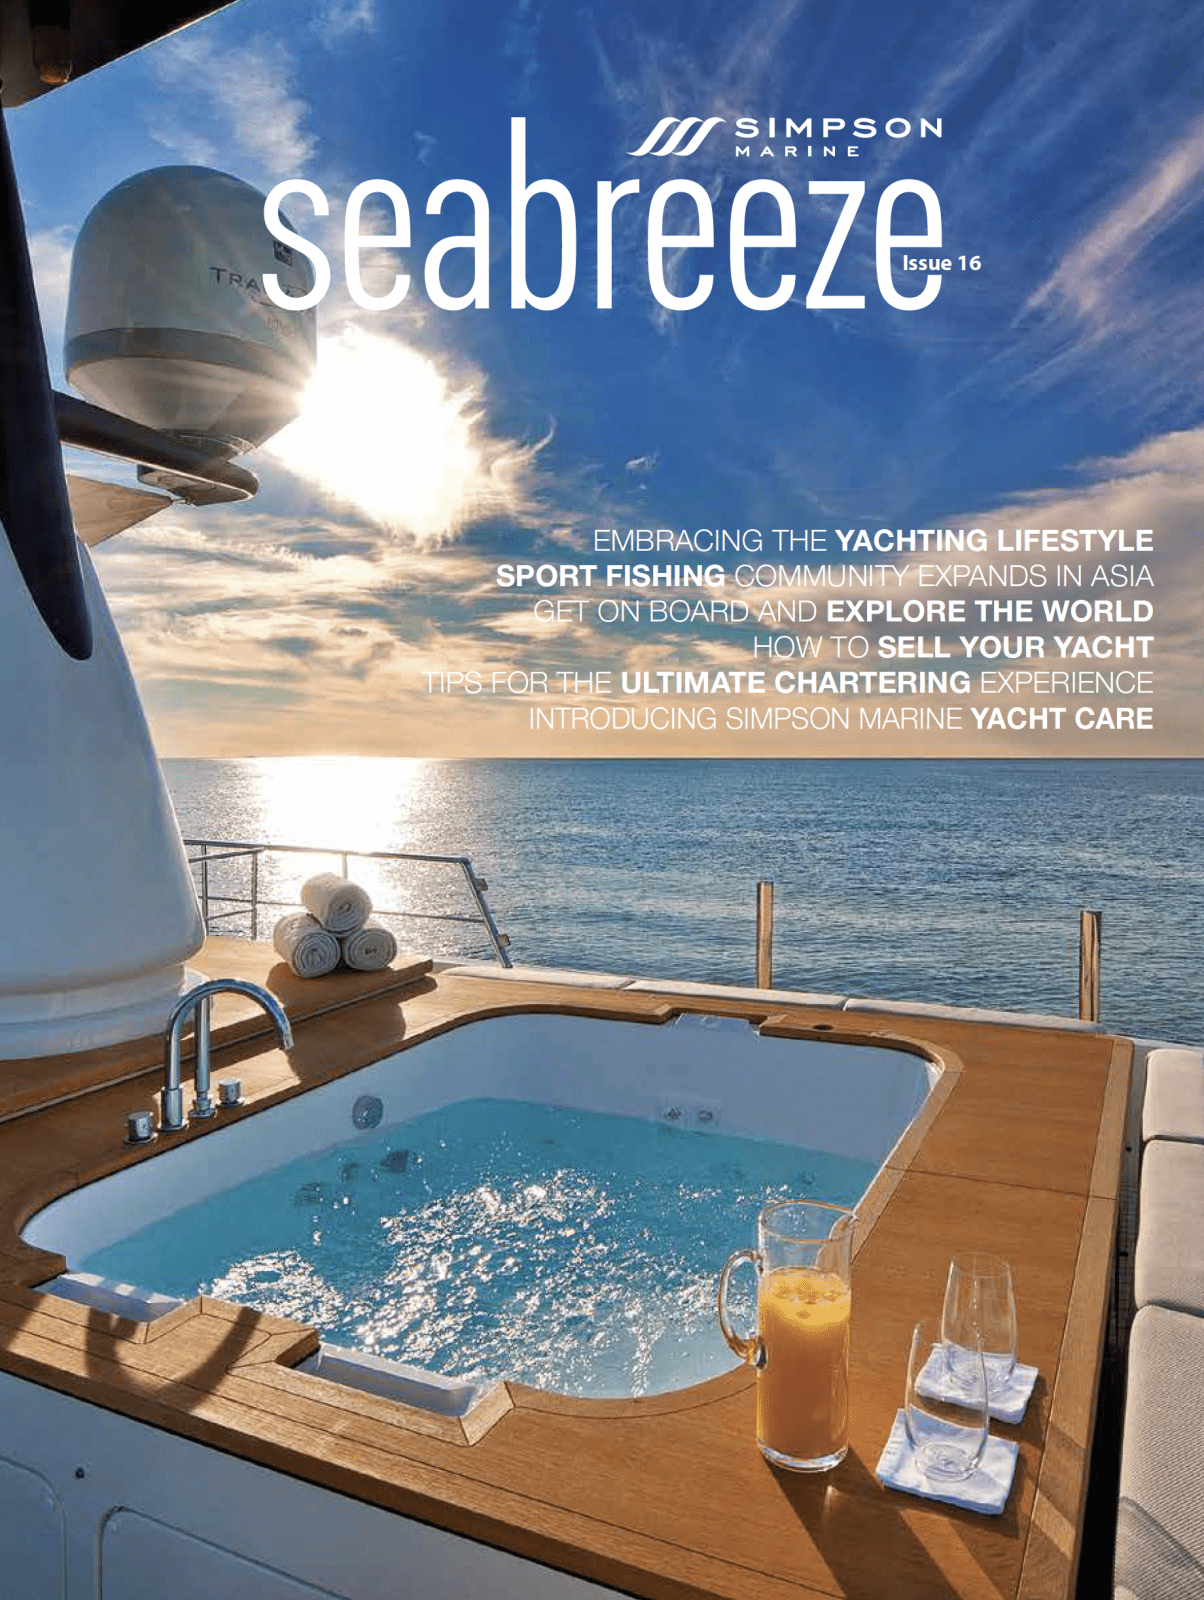 Simpson Marine - Issue 2016/2017